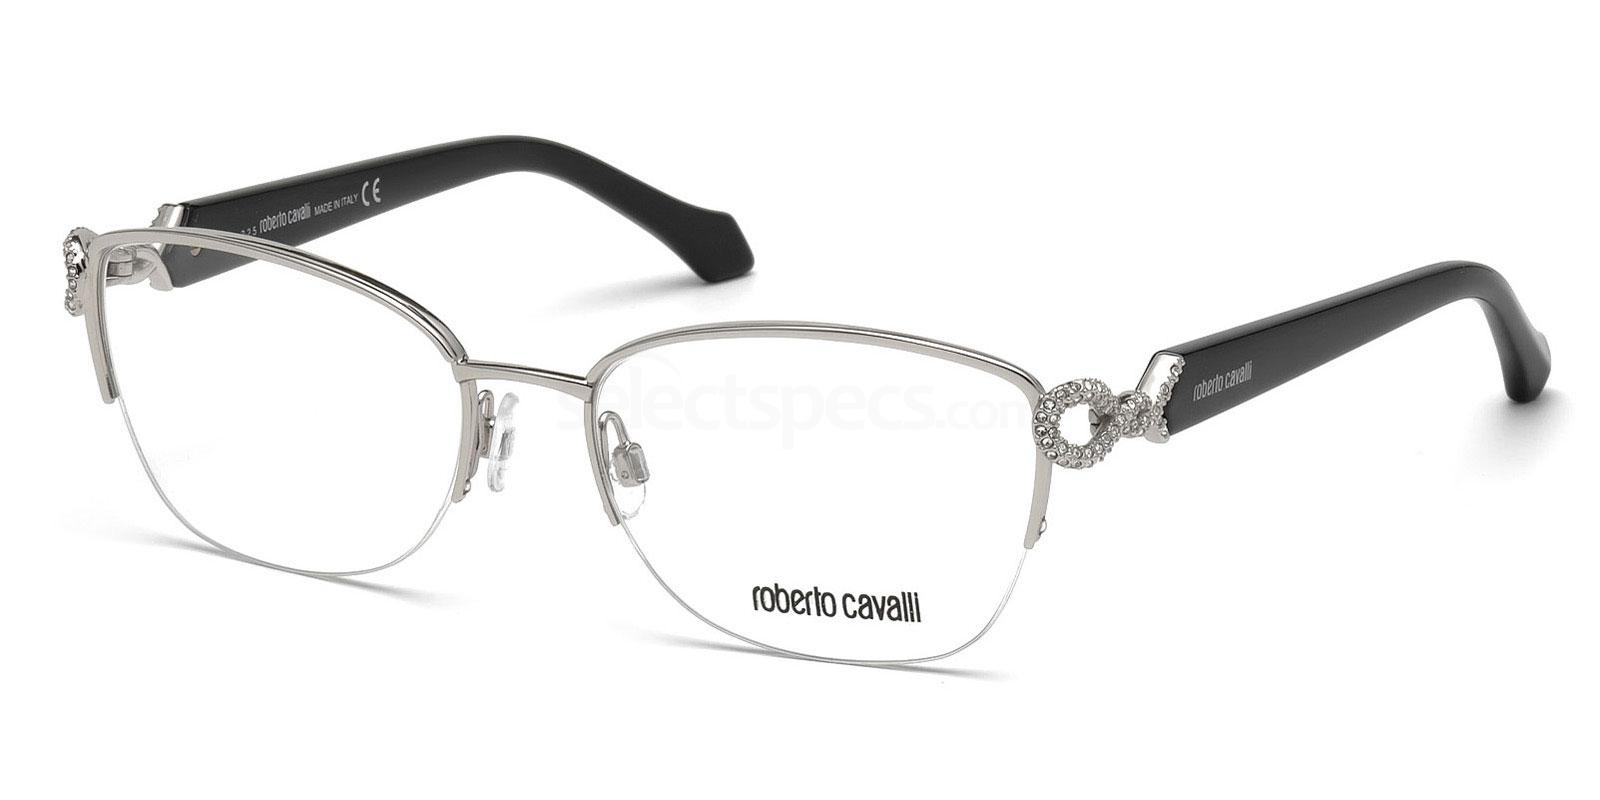 016 RC5018 Glasses, Roberto Cavalli